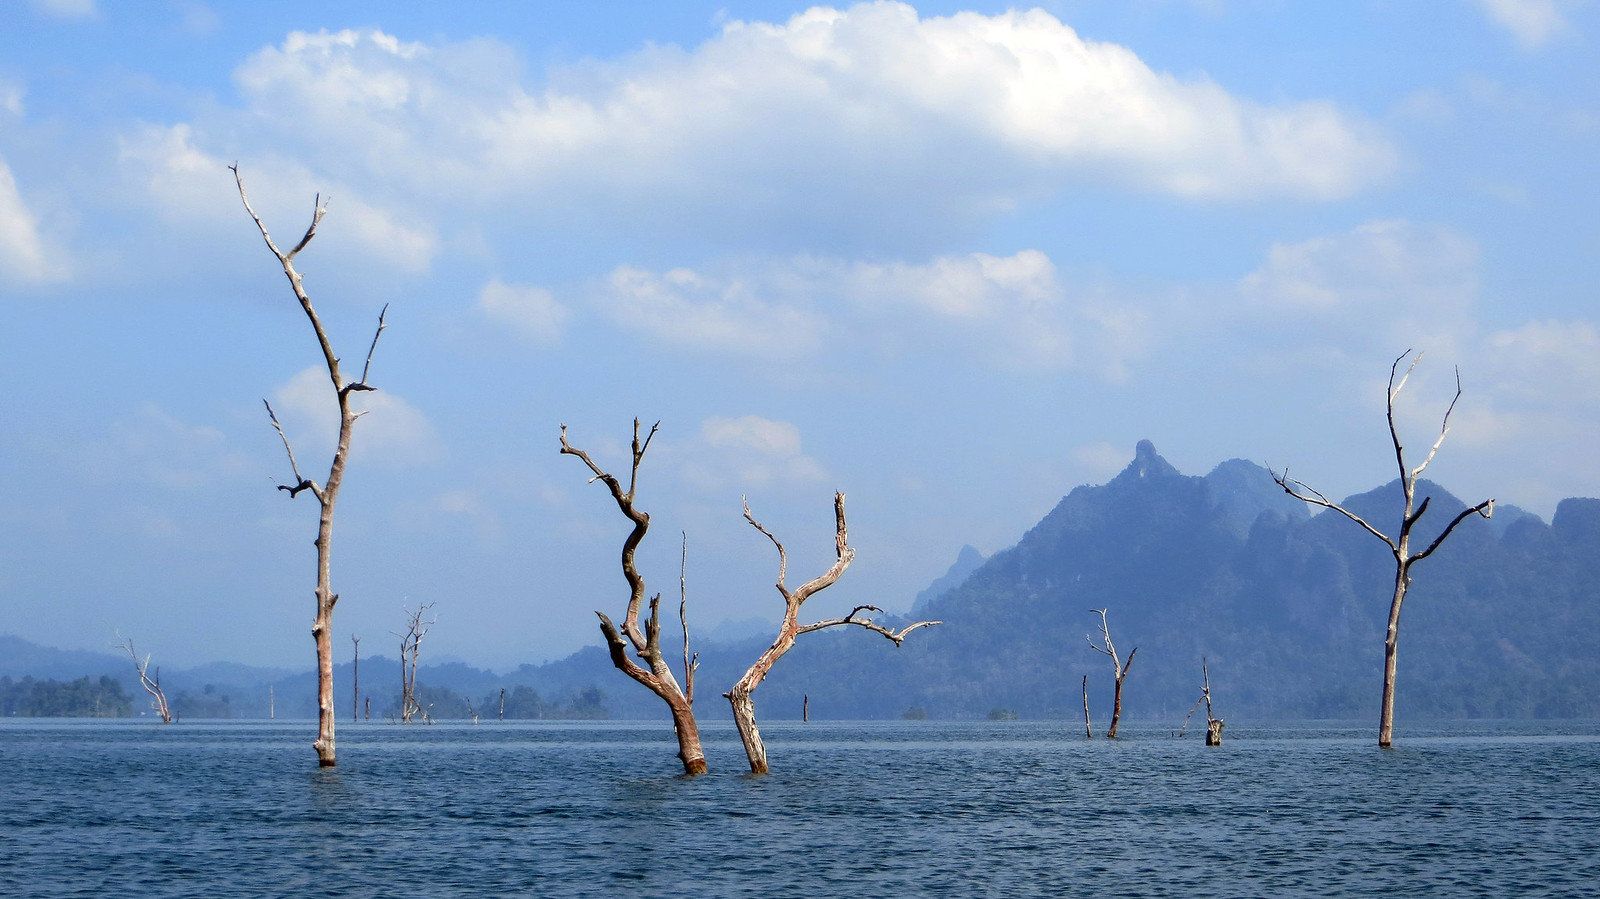 Dark side of traveling - Ratchaprapra Dam, Khao Sok National Park, Thailand, Jan 2014